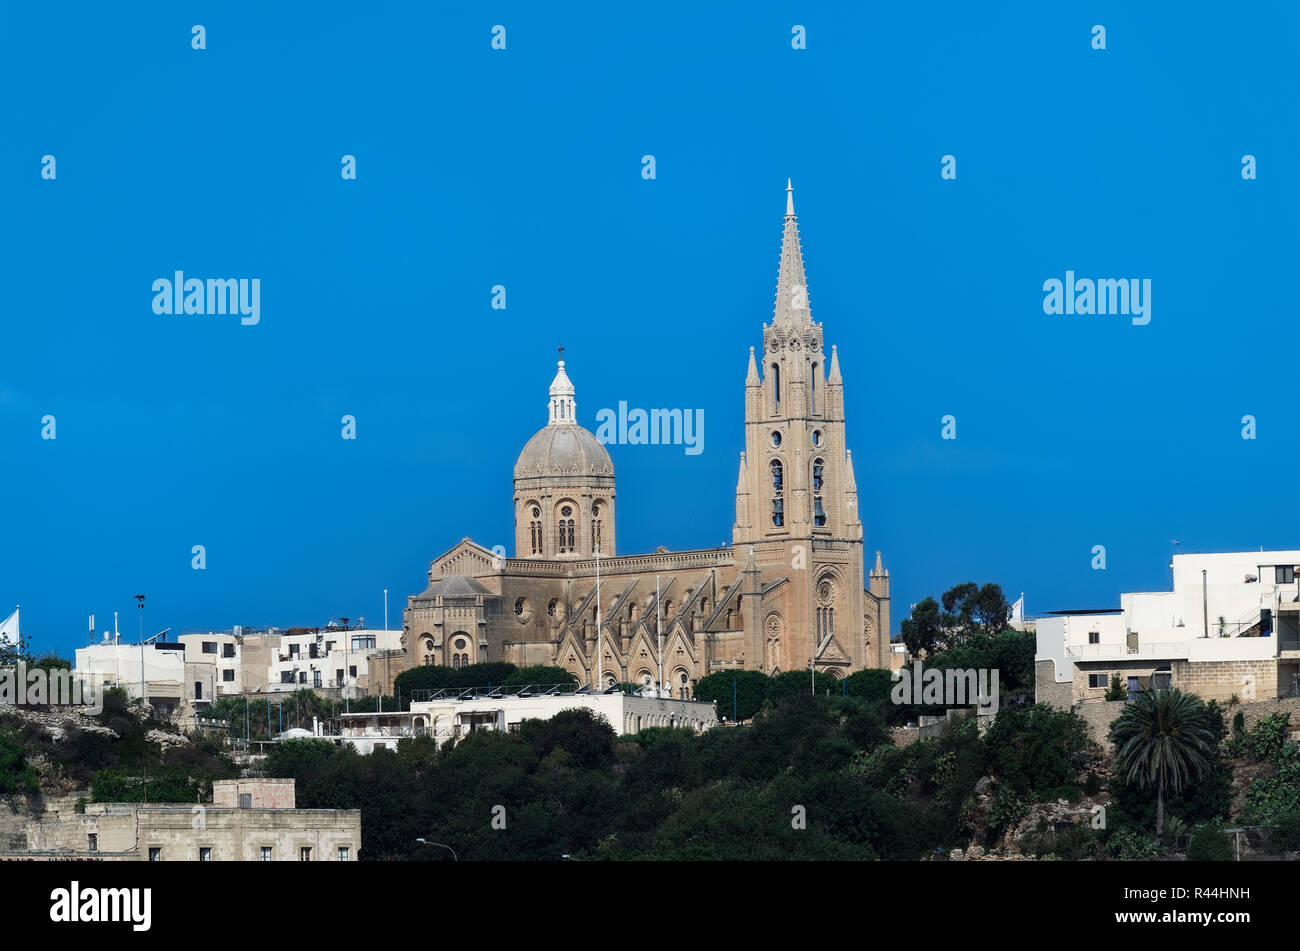 Parish Church of Our Lady of Loreto (Ghajnsielem), Mgarr. Maltese island of Gozo - Stock Image